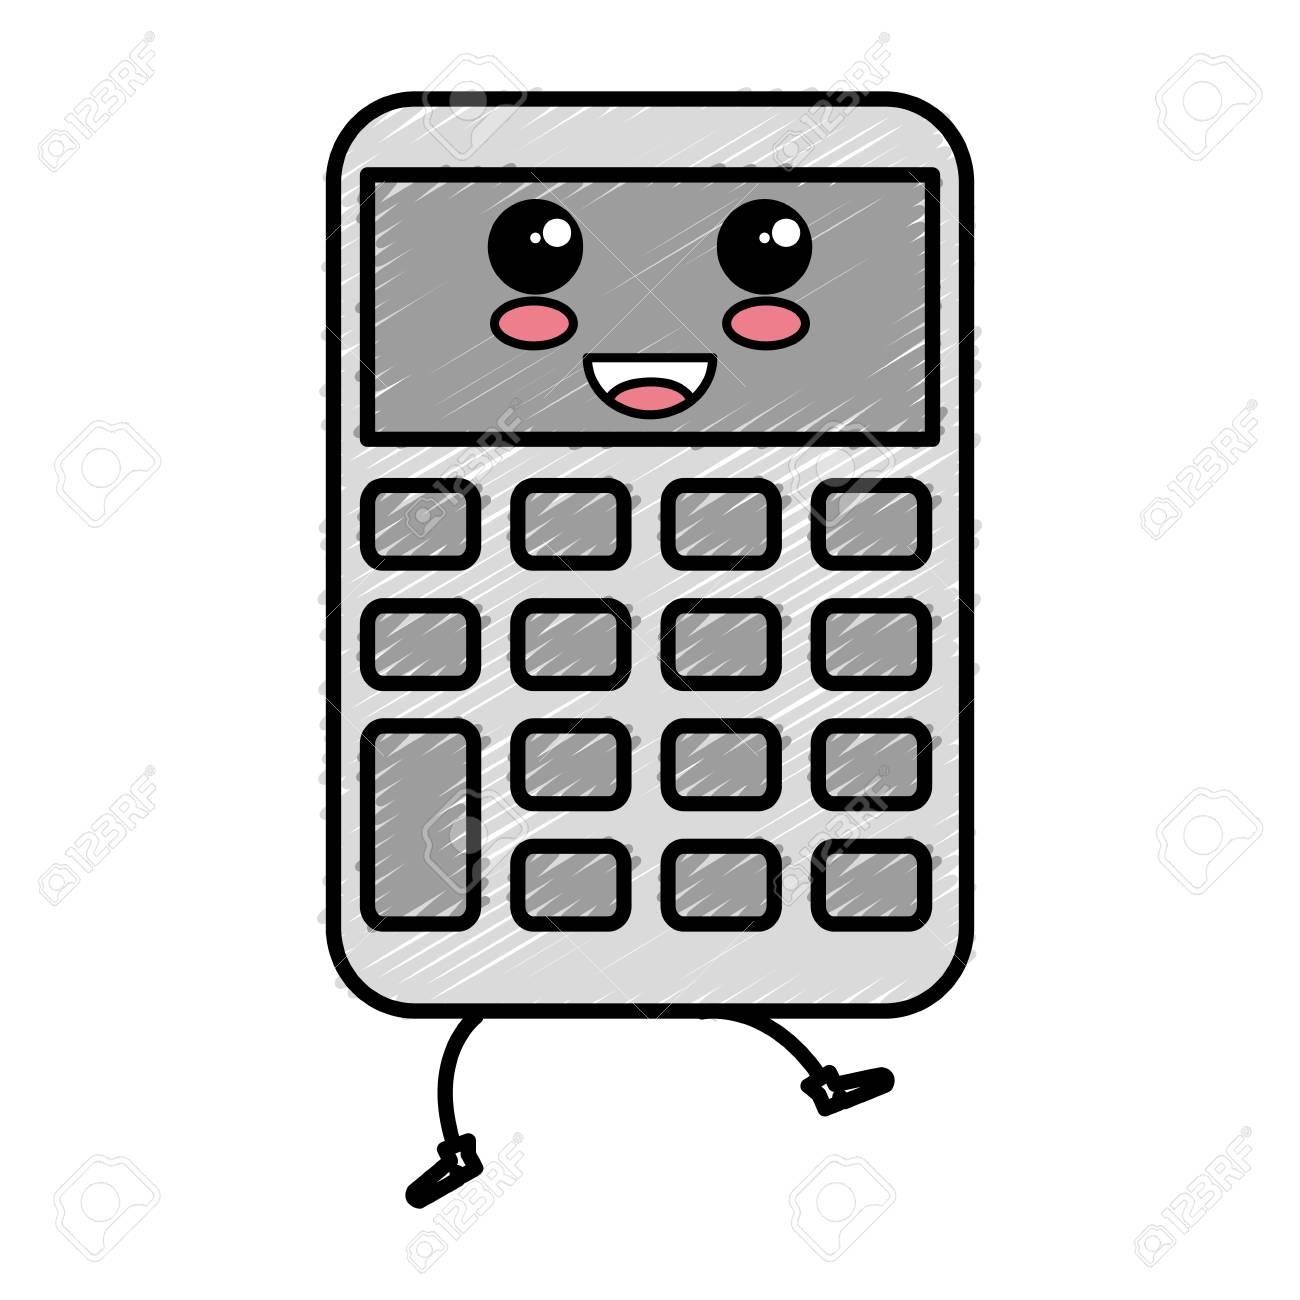 Matematicas Imagenes Kawaii Wwwimagenesmycom